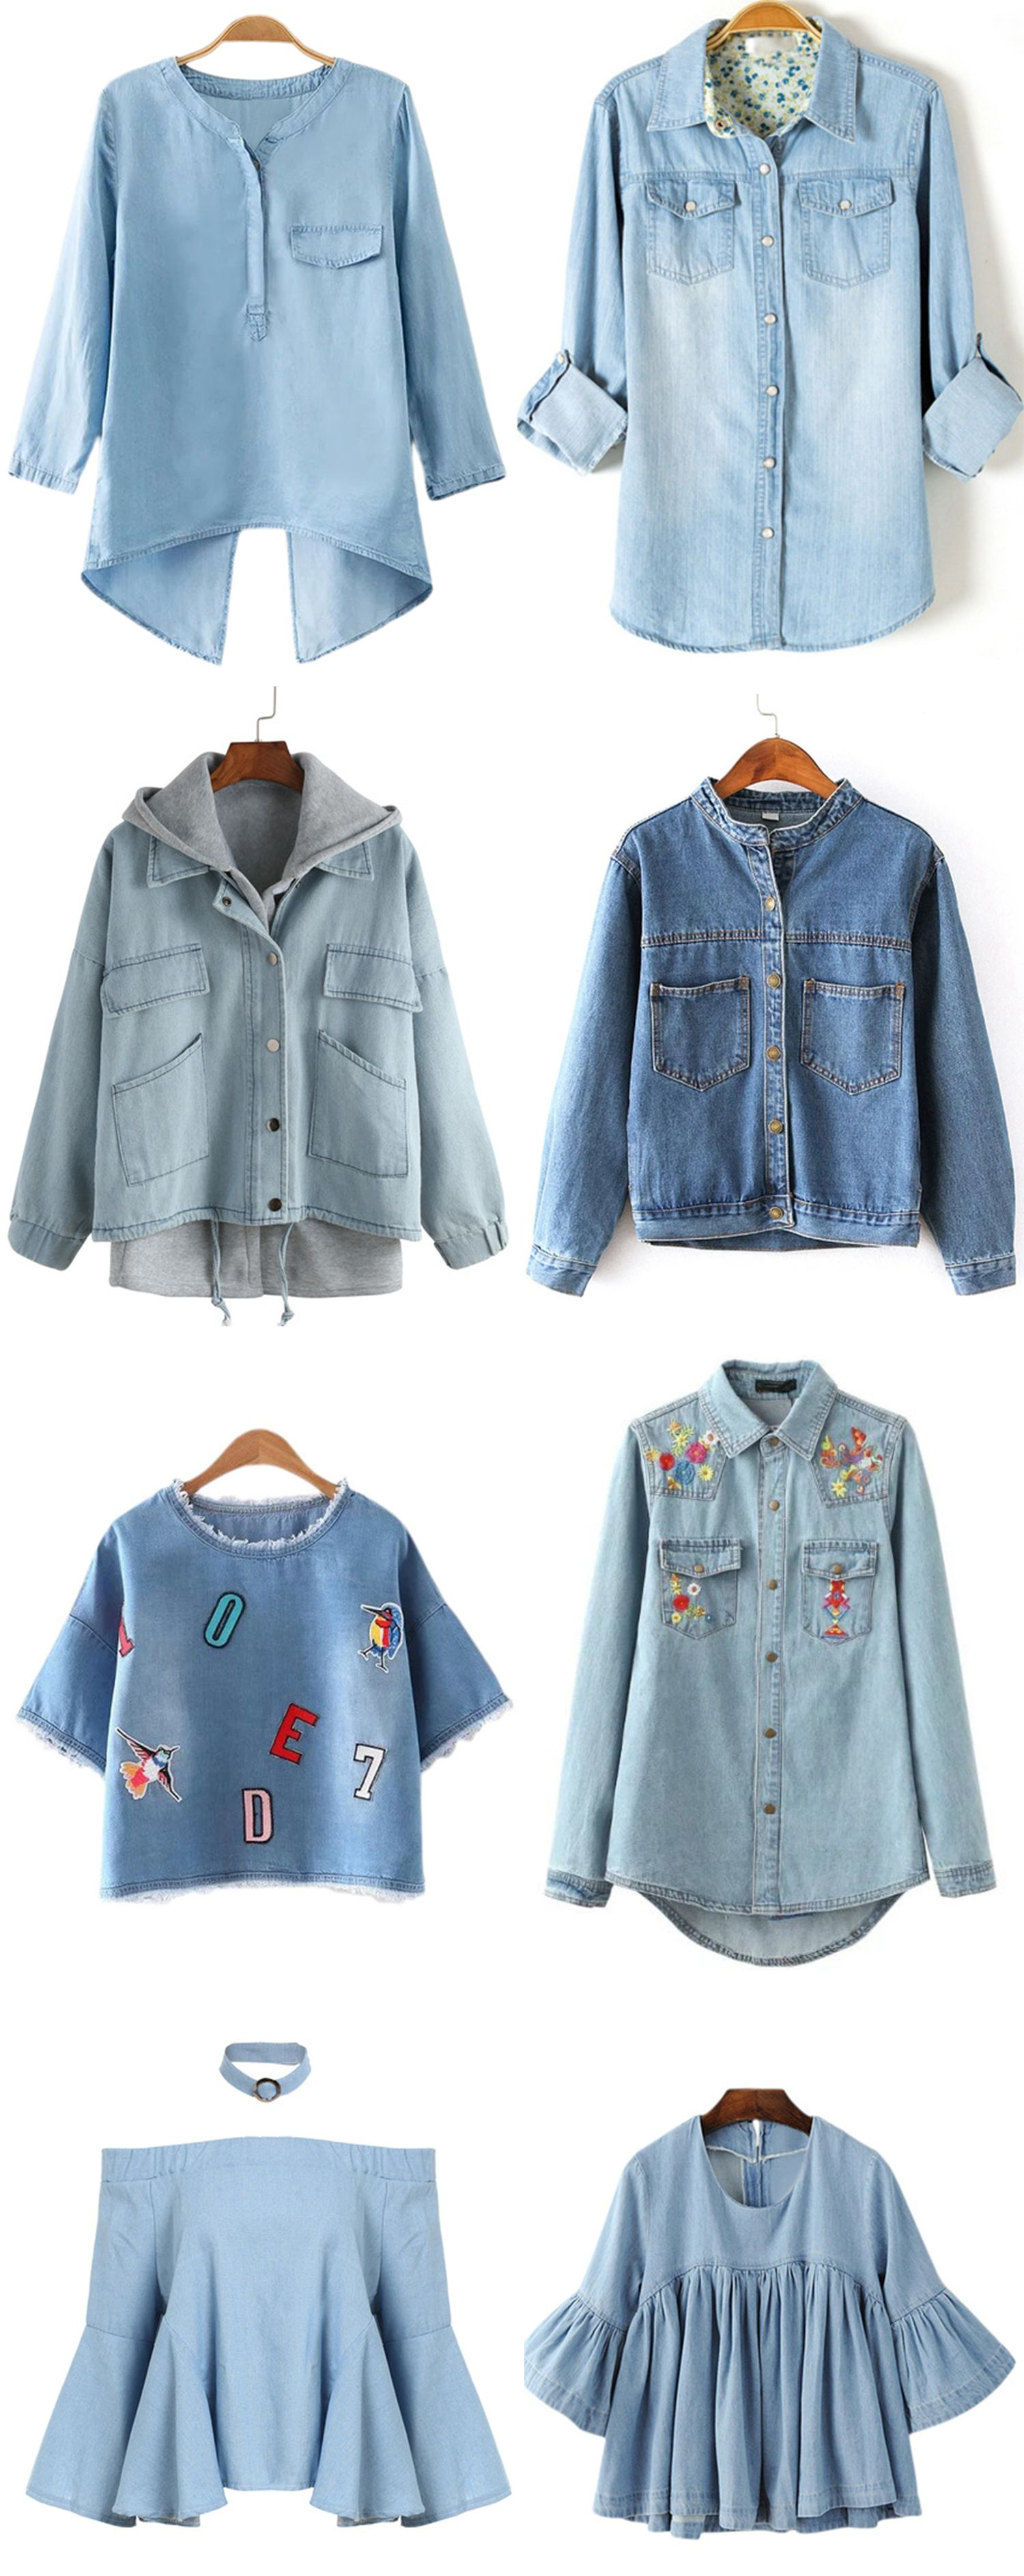 Denim Fashion - Romwe.com